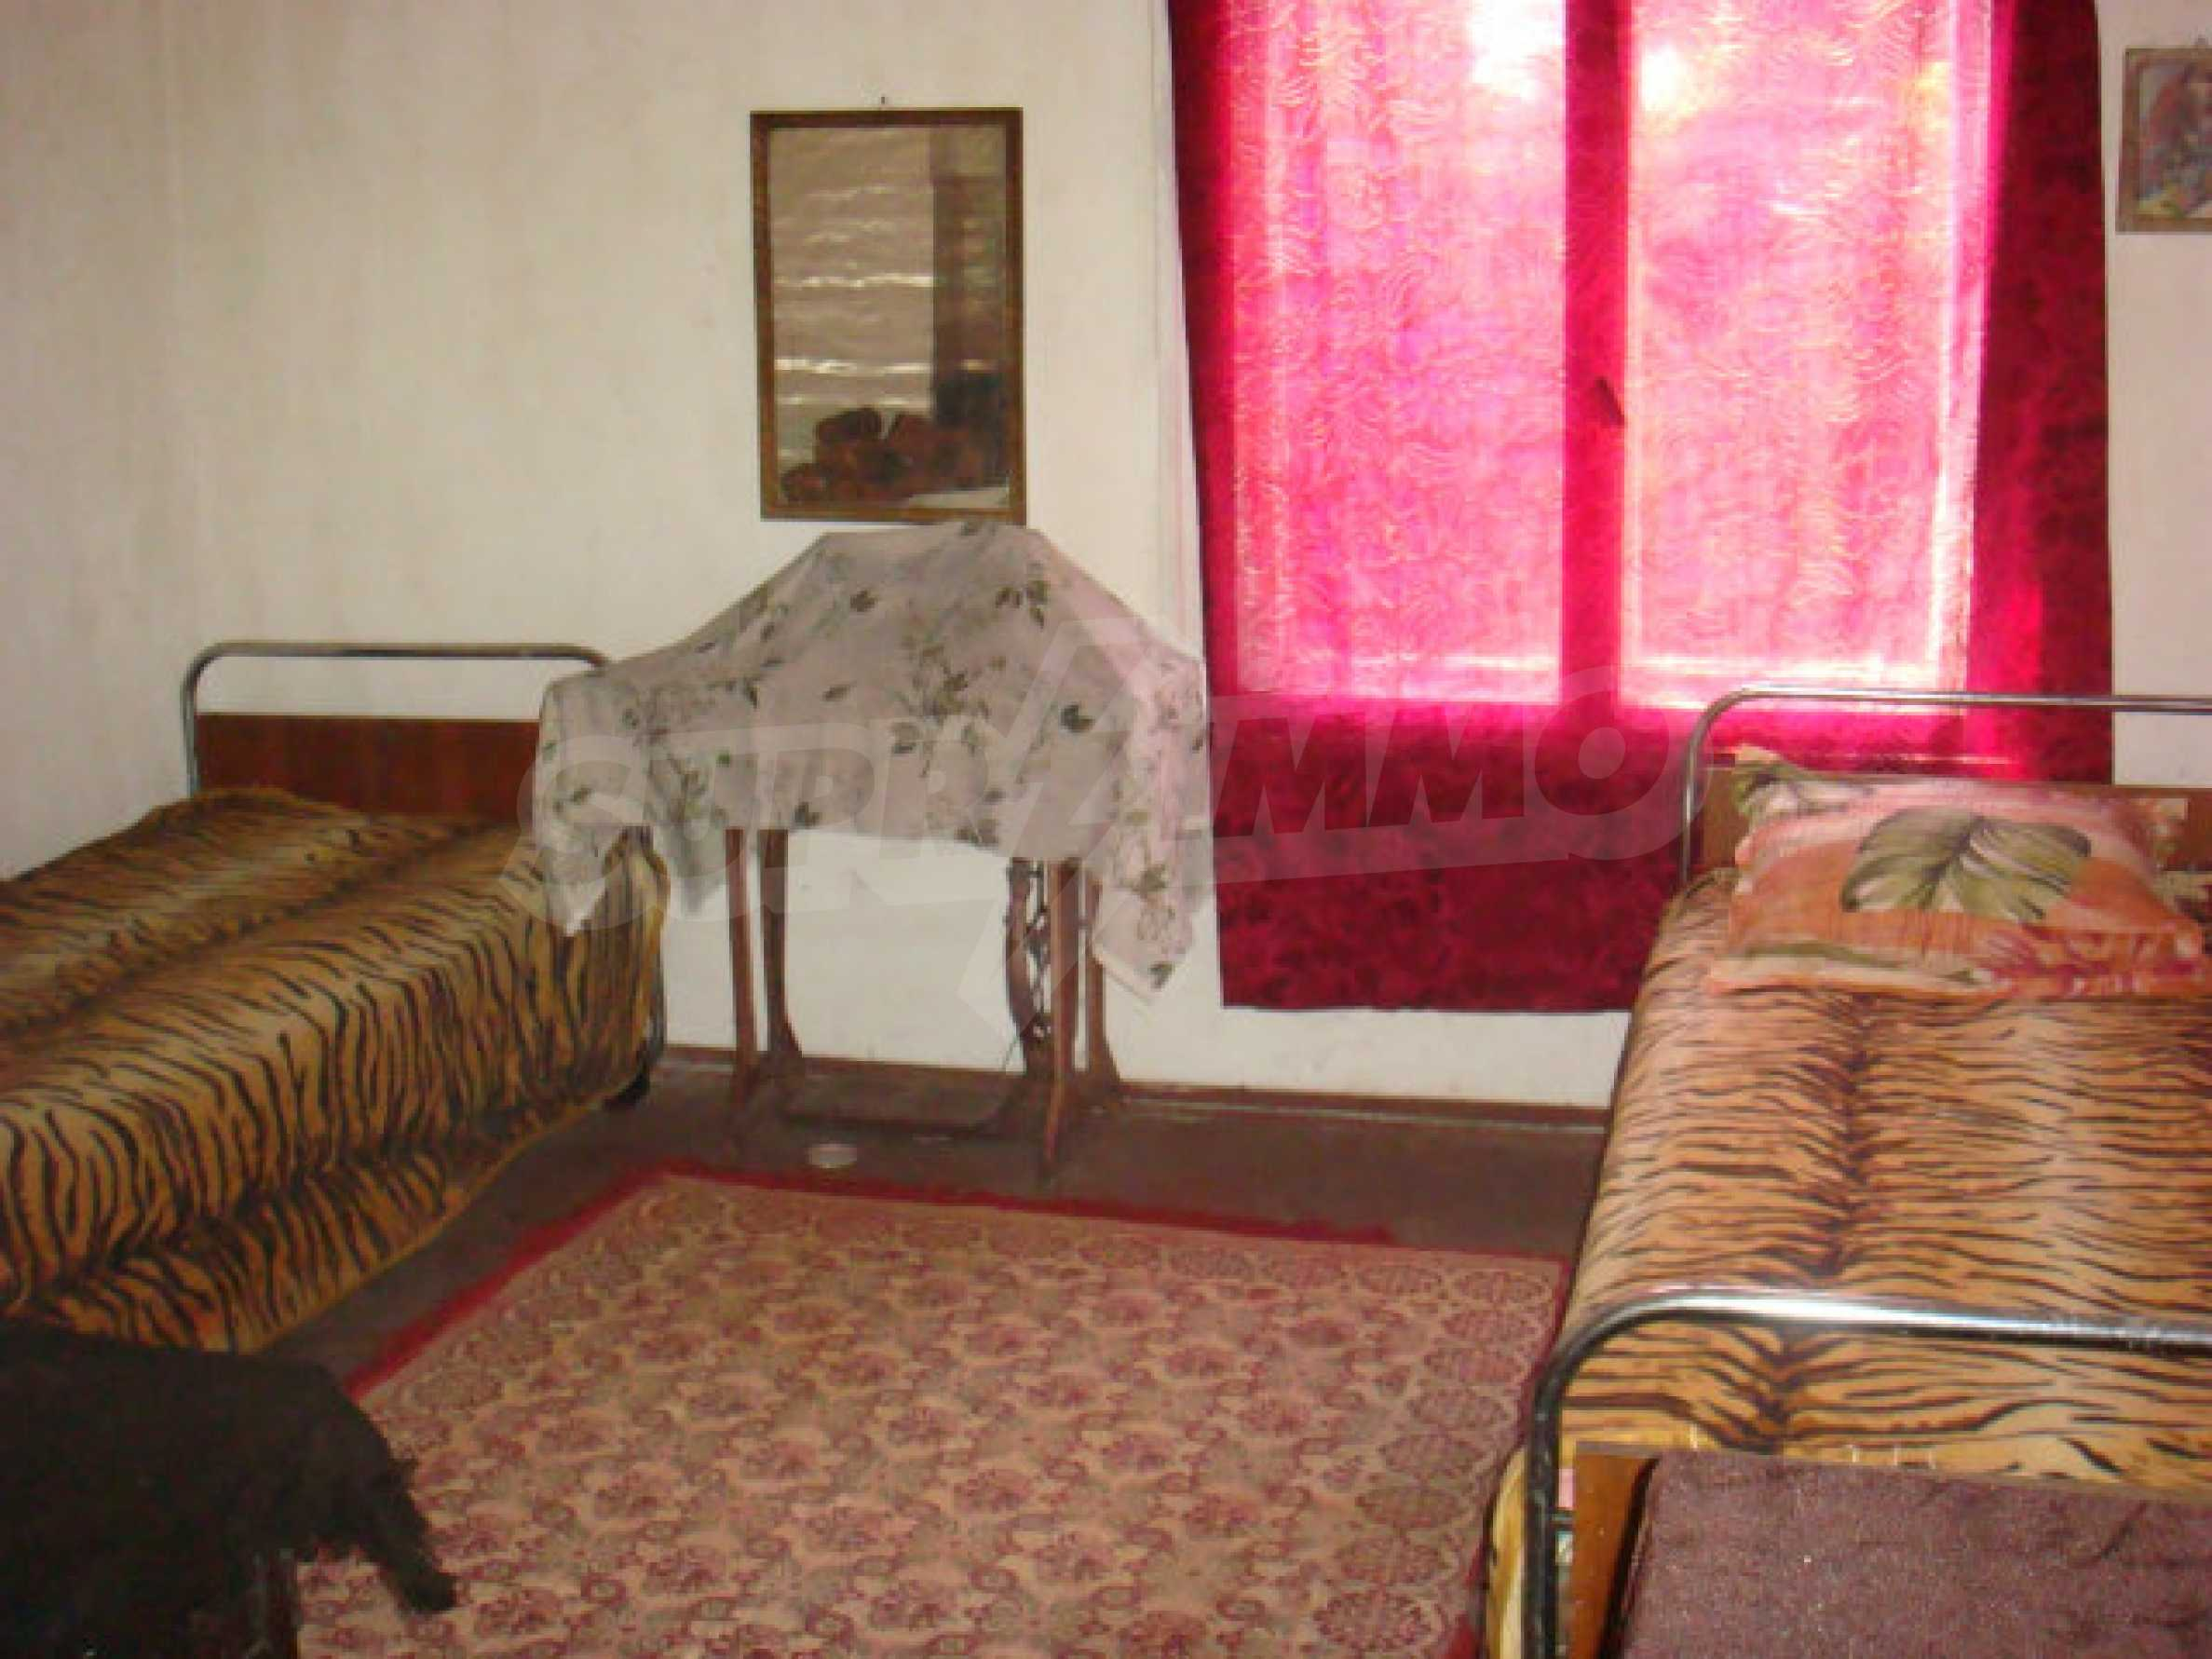 House for sale in village near Vidin 13